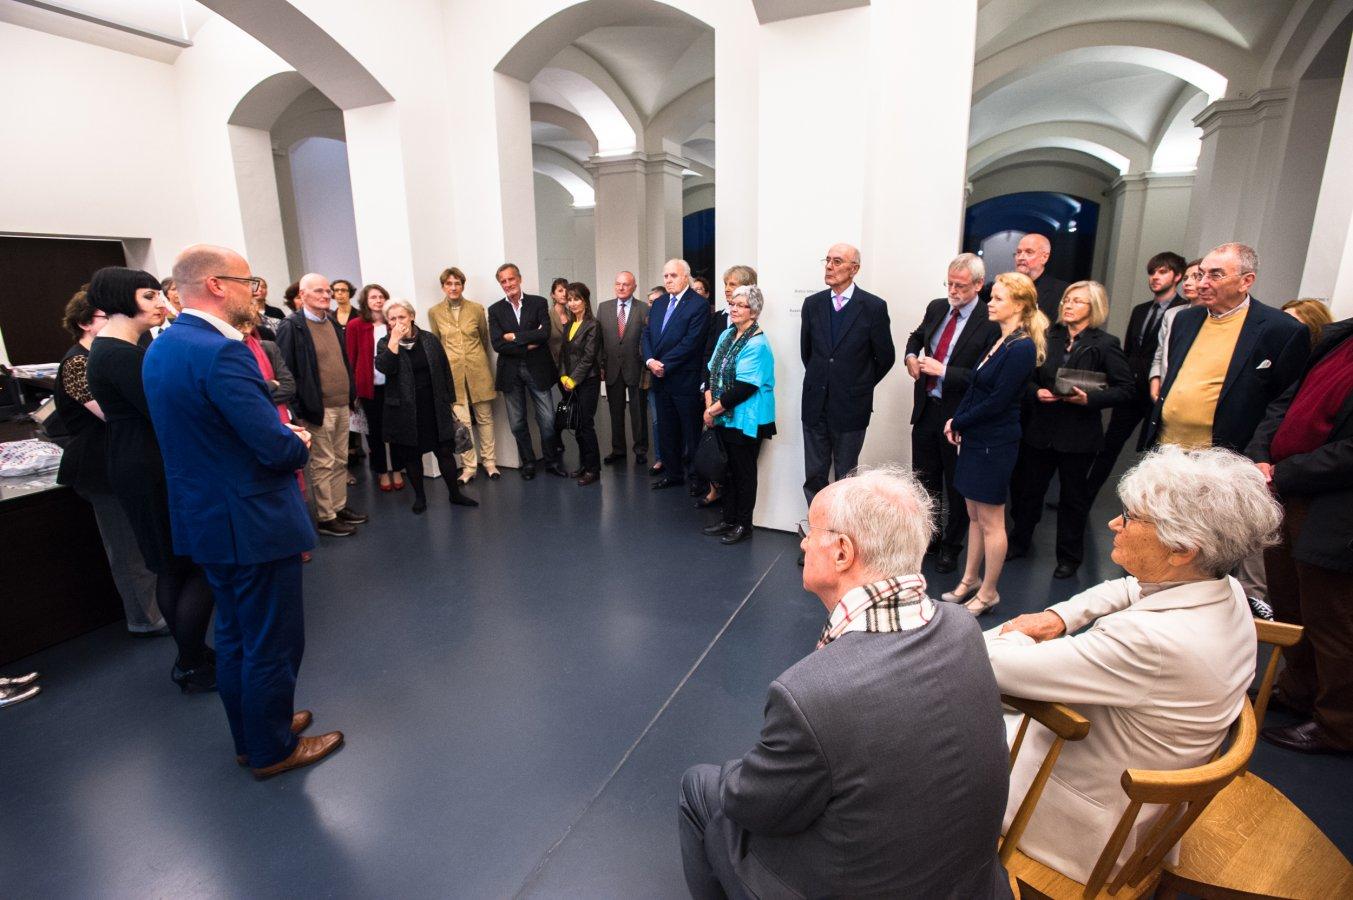 Preview of the exhibition »Der Max ist da!« with the Association of Friends of the Max Ernst Museum Brühl  © Arp Museum Bahnhof Rolandseck, photo: Lothar Kornblum